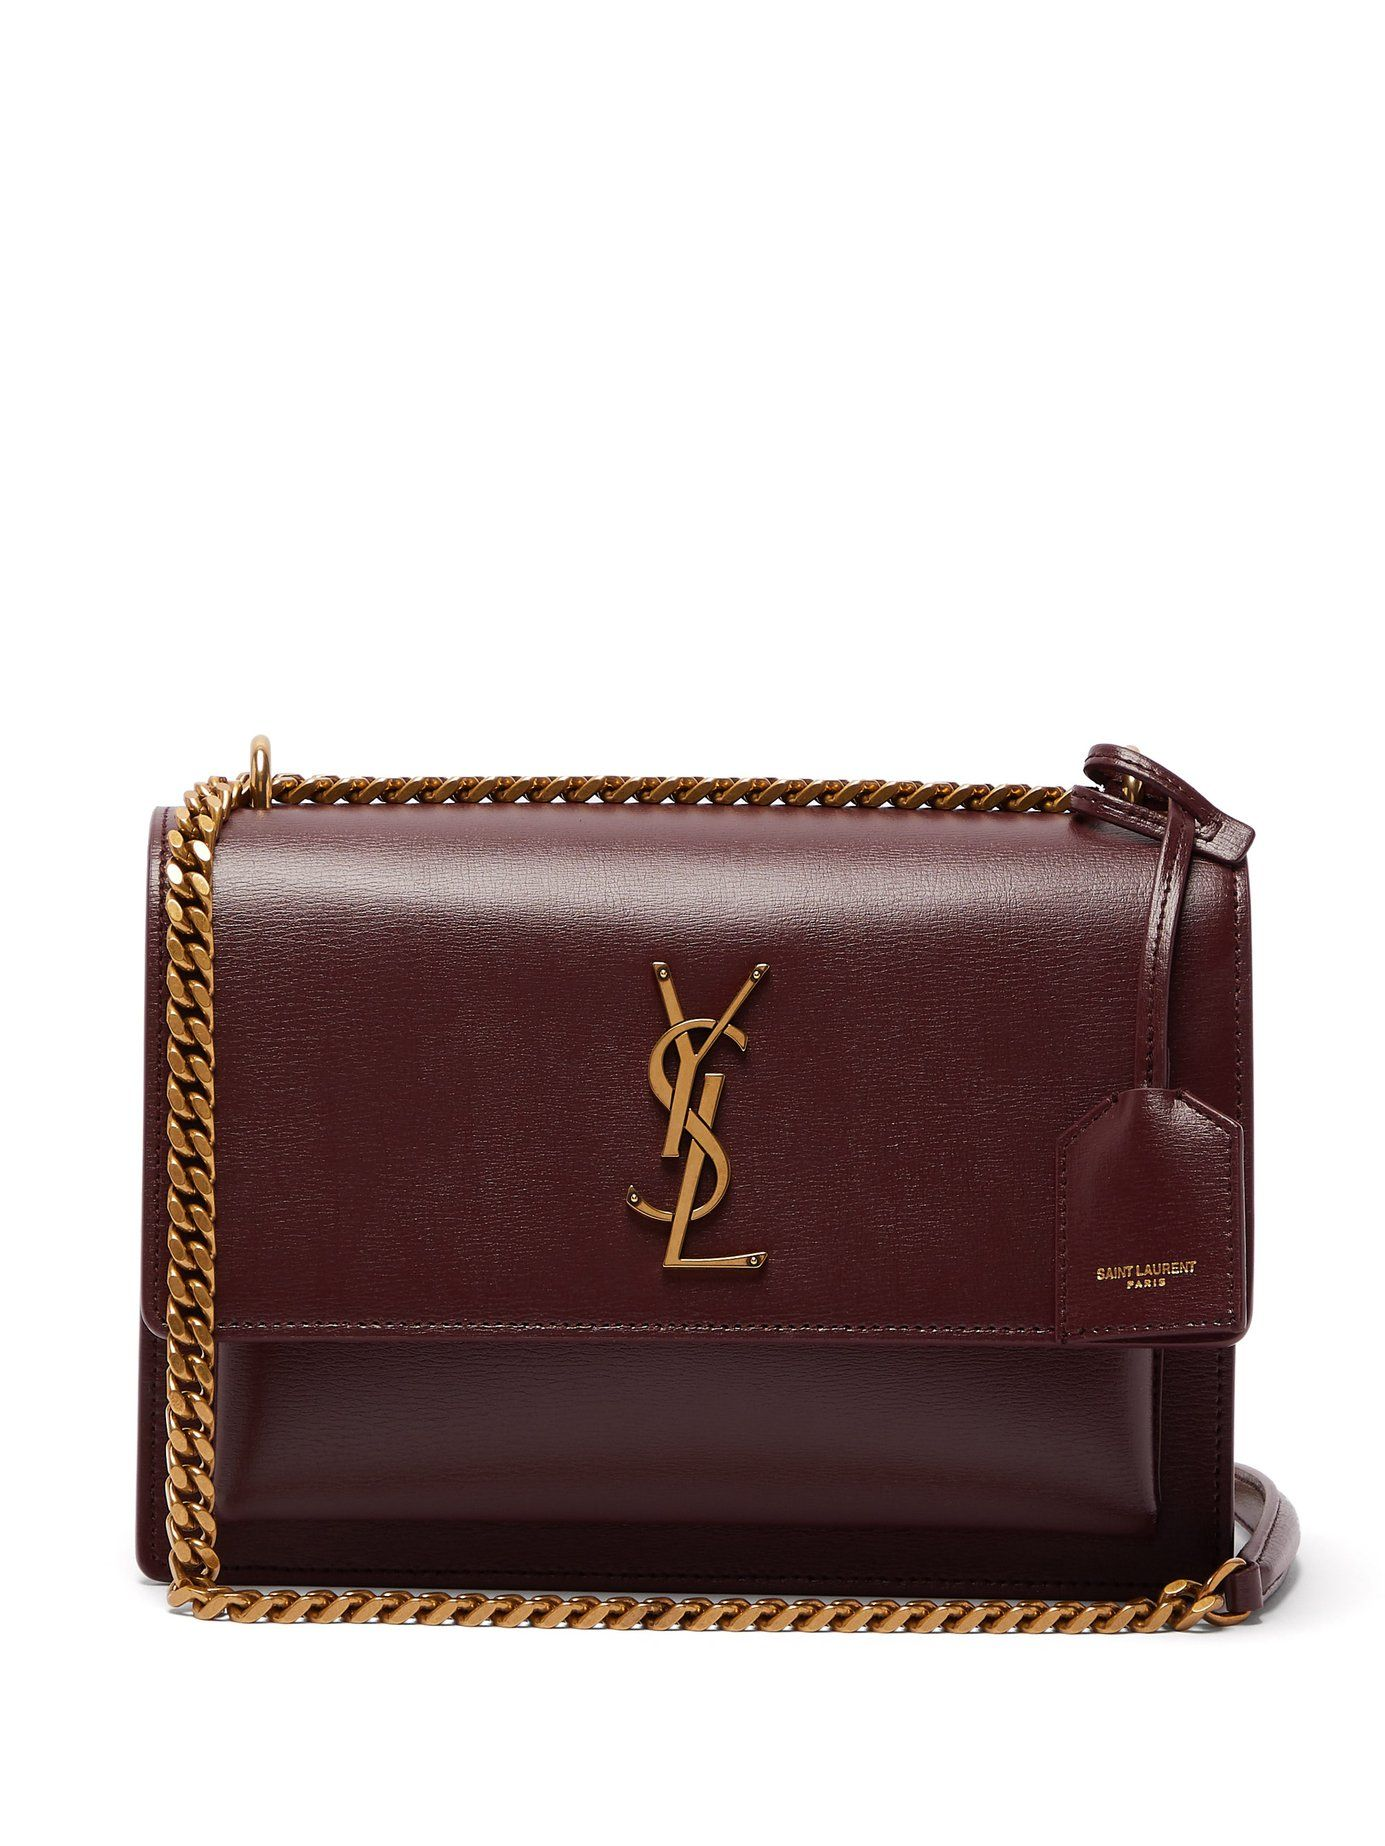 daf096acba8 Sunset medium leather cross-body bag | Saint Laurent | MATCHESFASHION.COM US